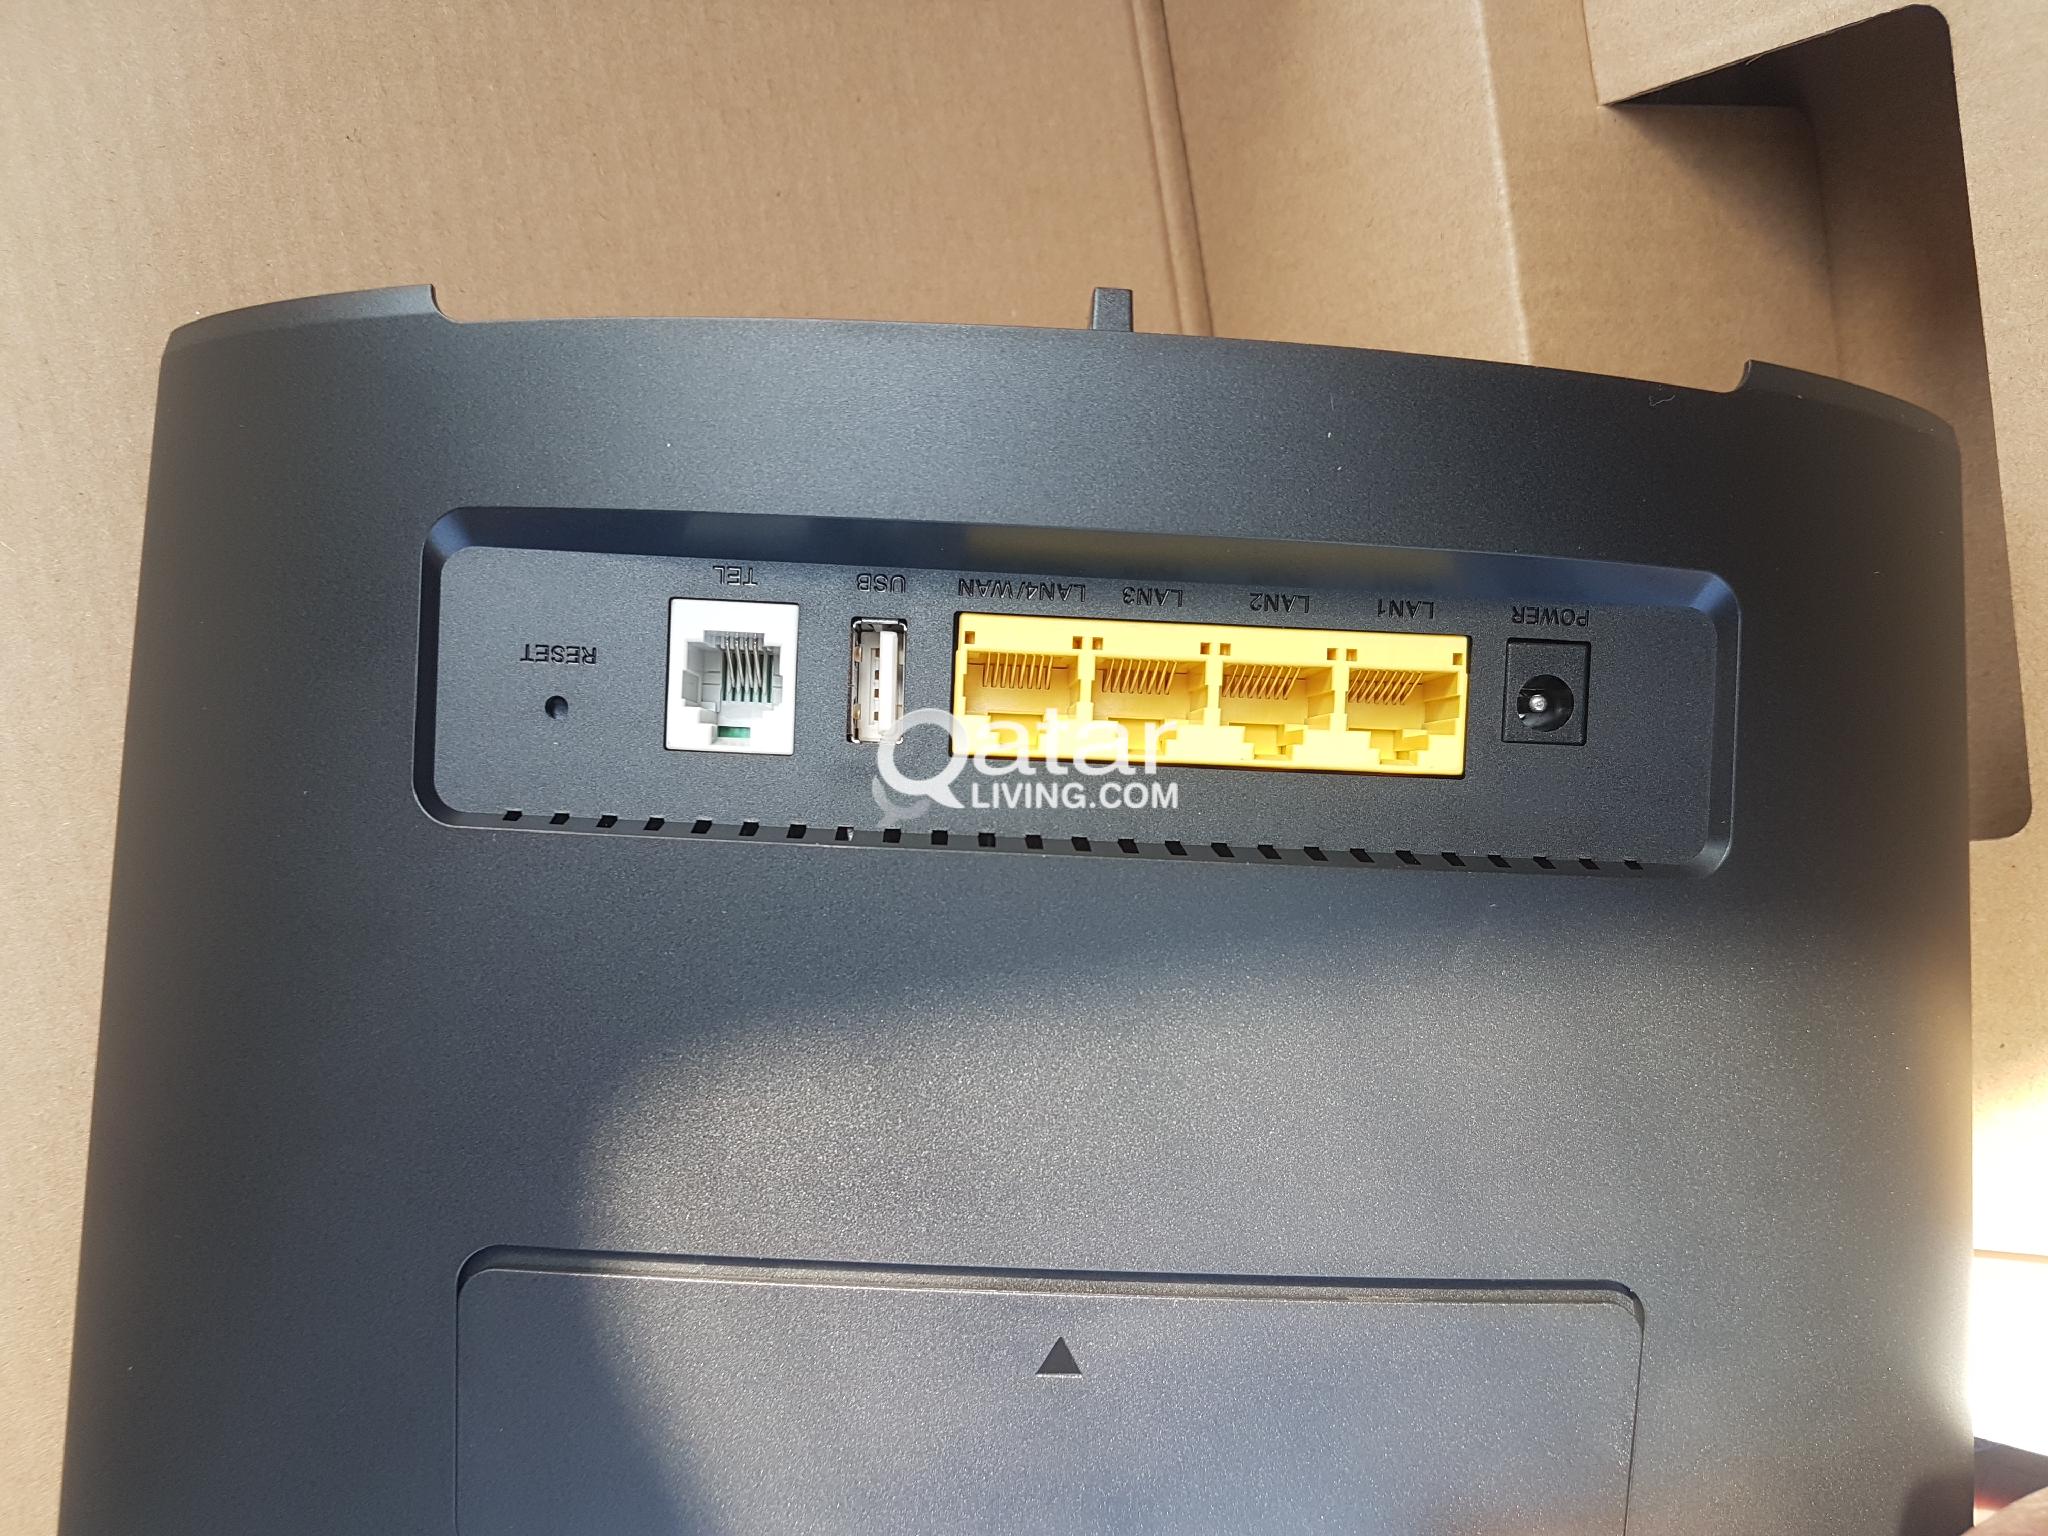 Huawei 4G Router | Qatar Living